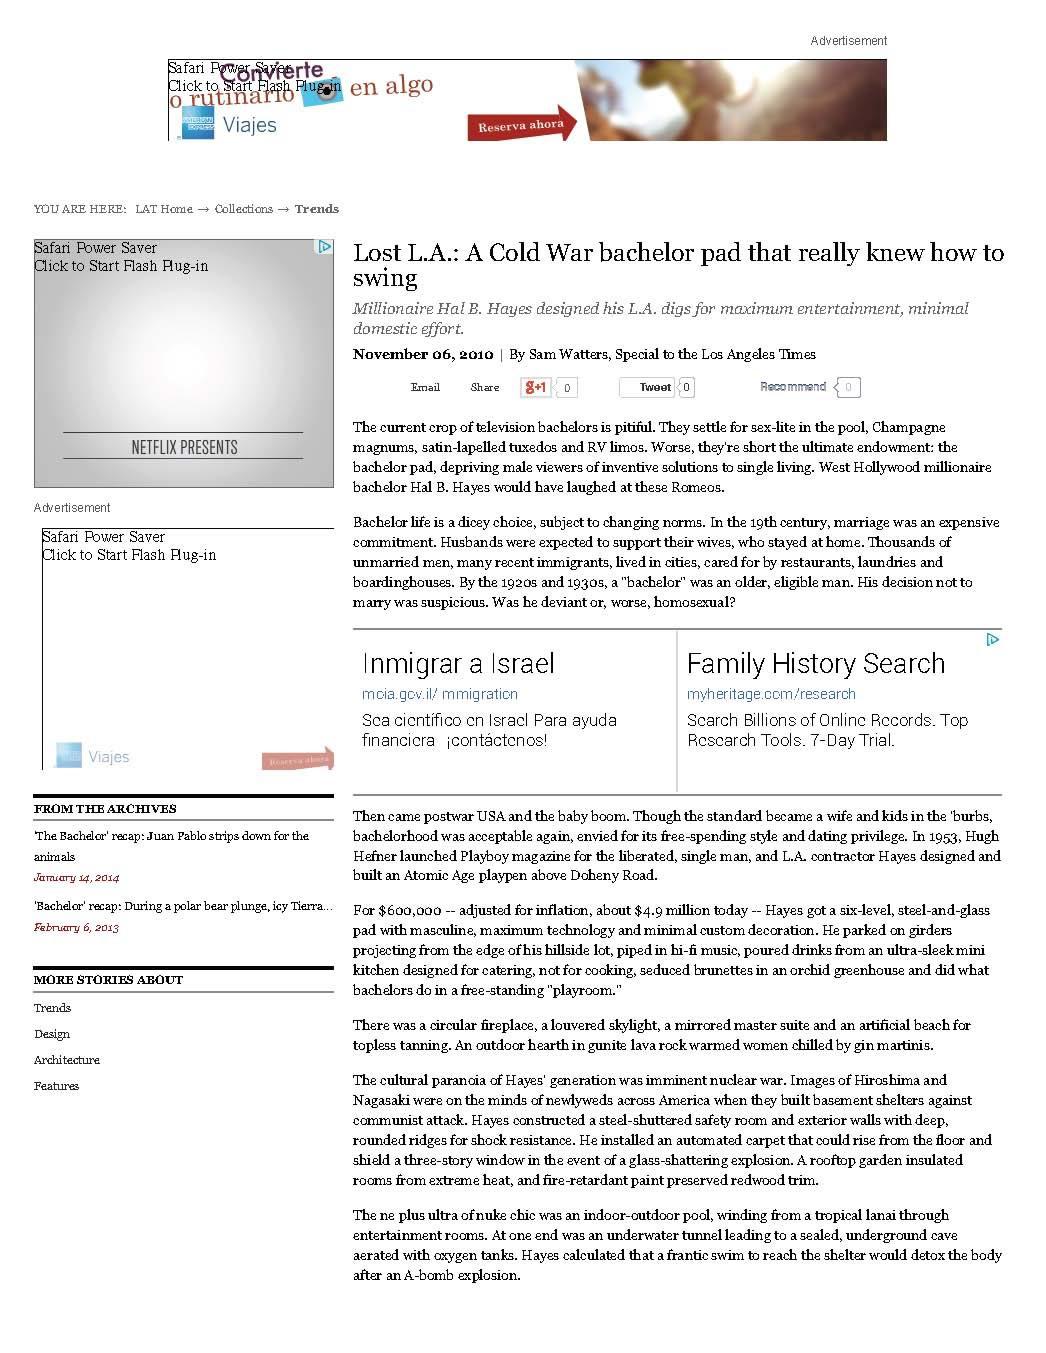 HBH_20101106LosAngelesTimes_Page_1